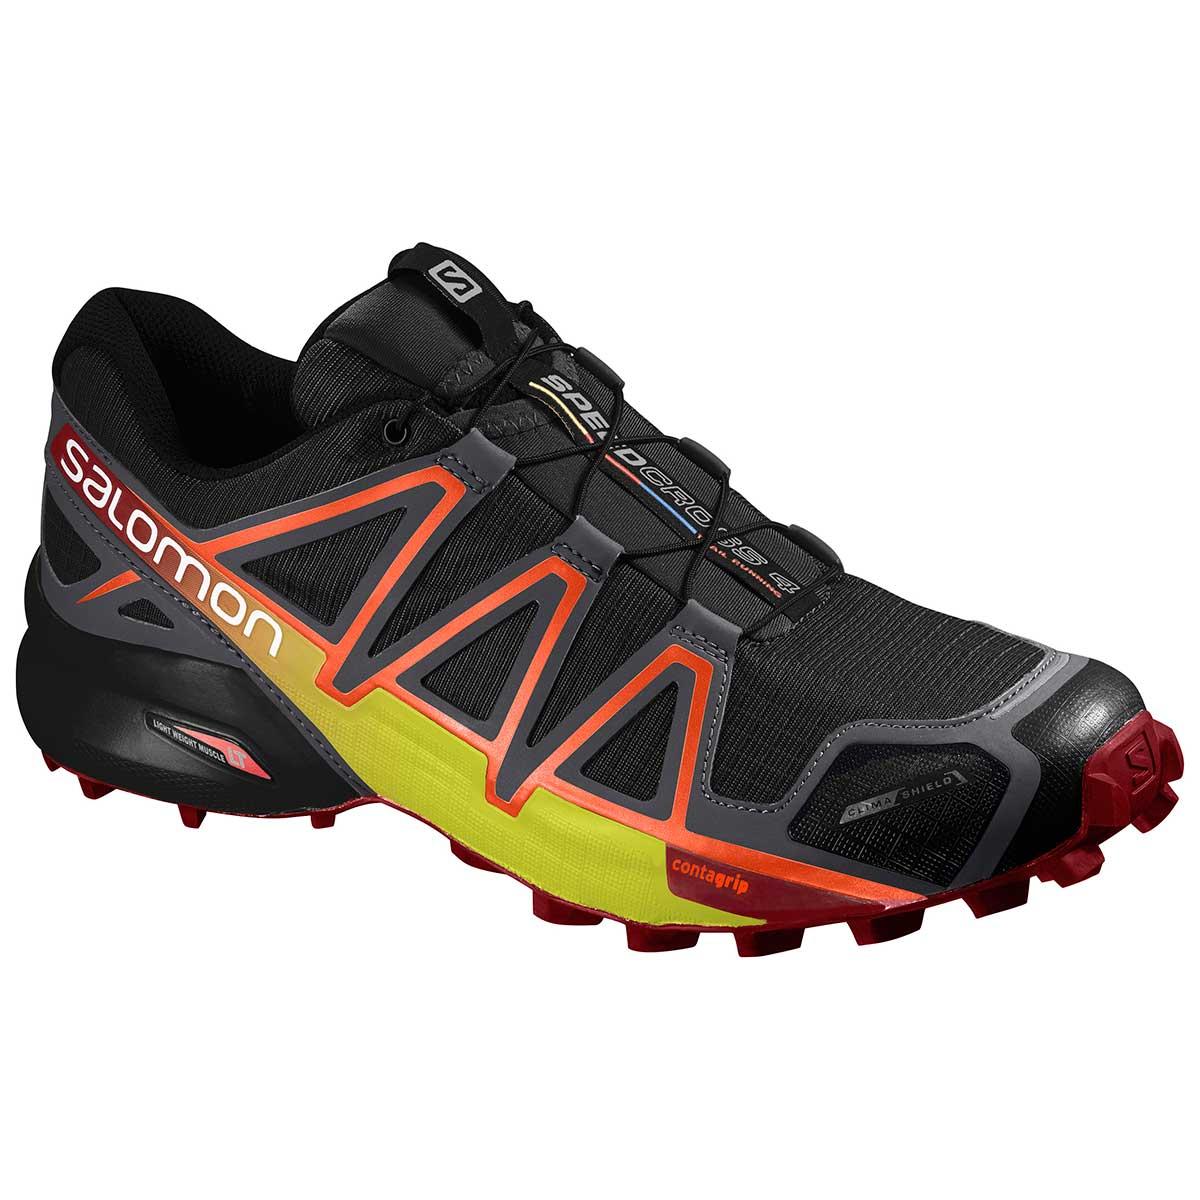 Buy Salomon SPEEDCROSS 4 CS Trail